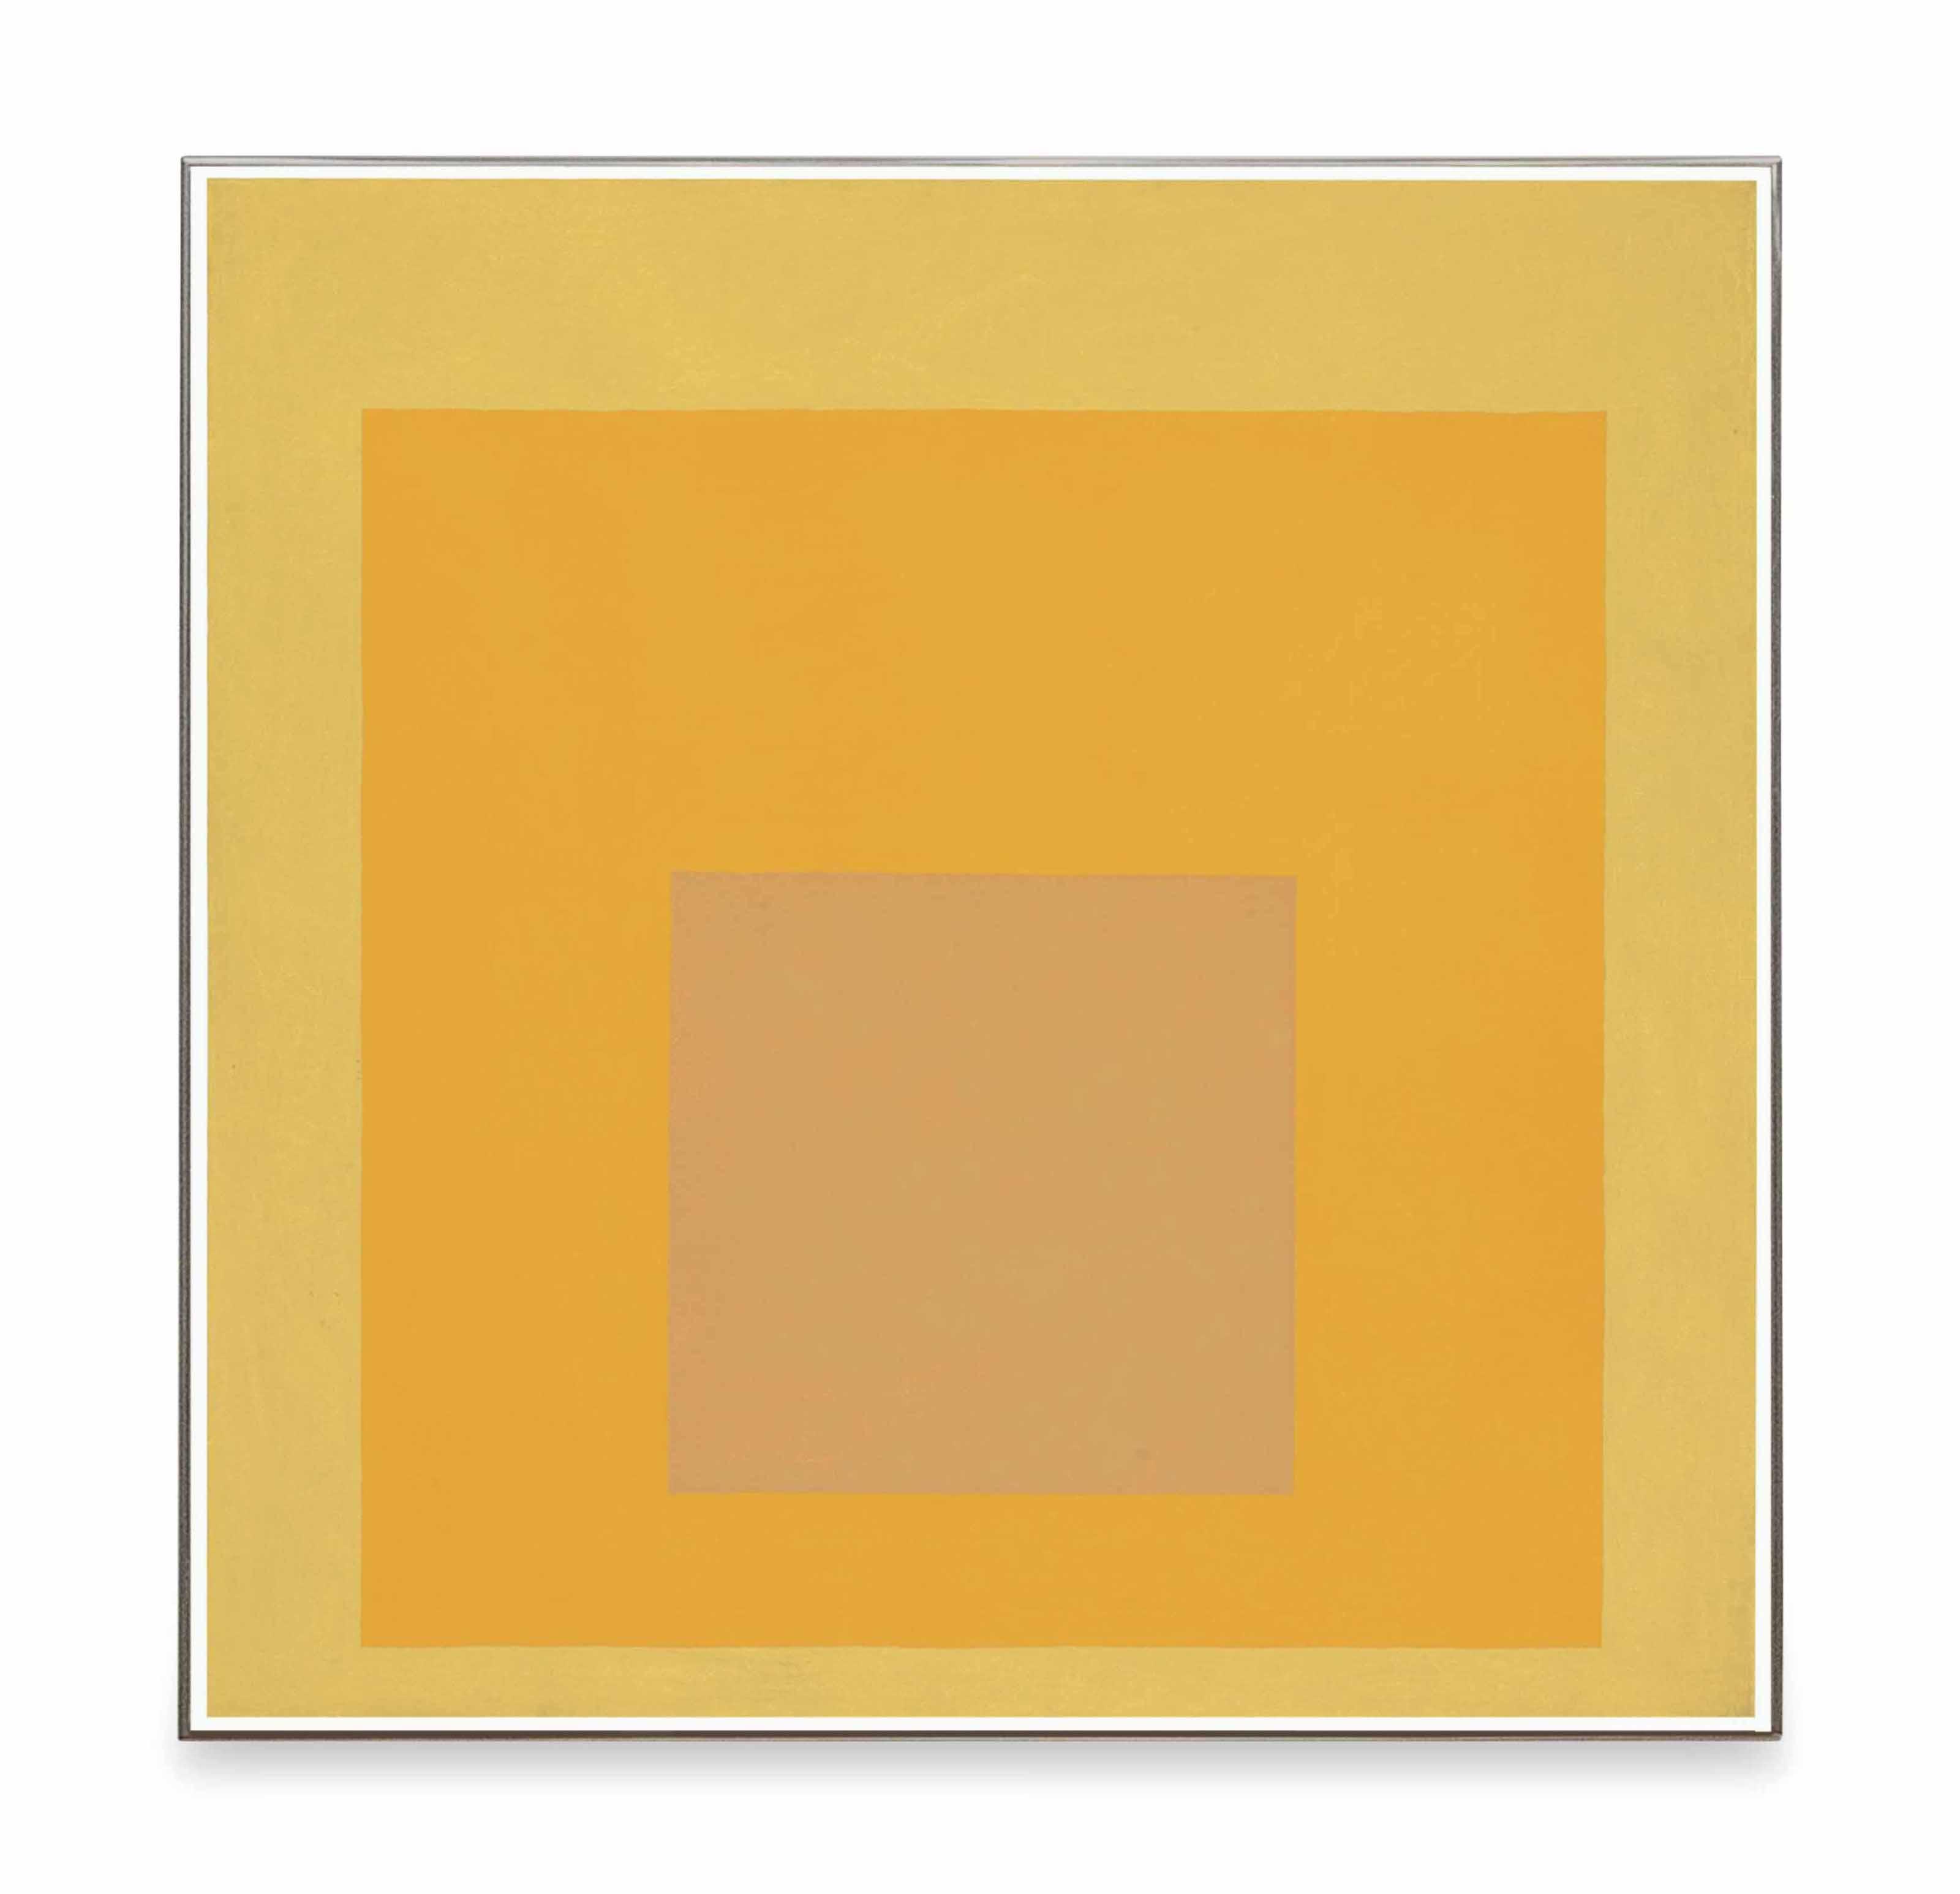 Homage to the Square: Orange Tone